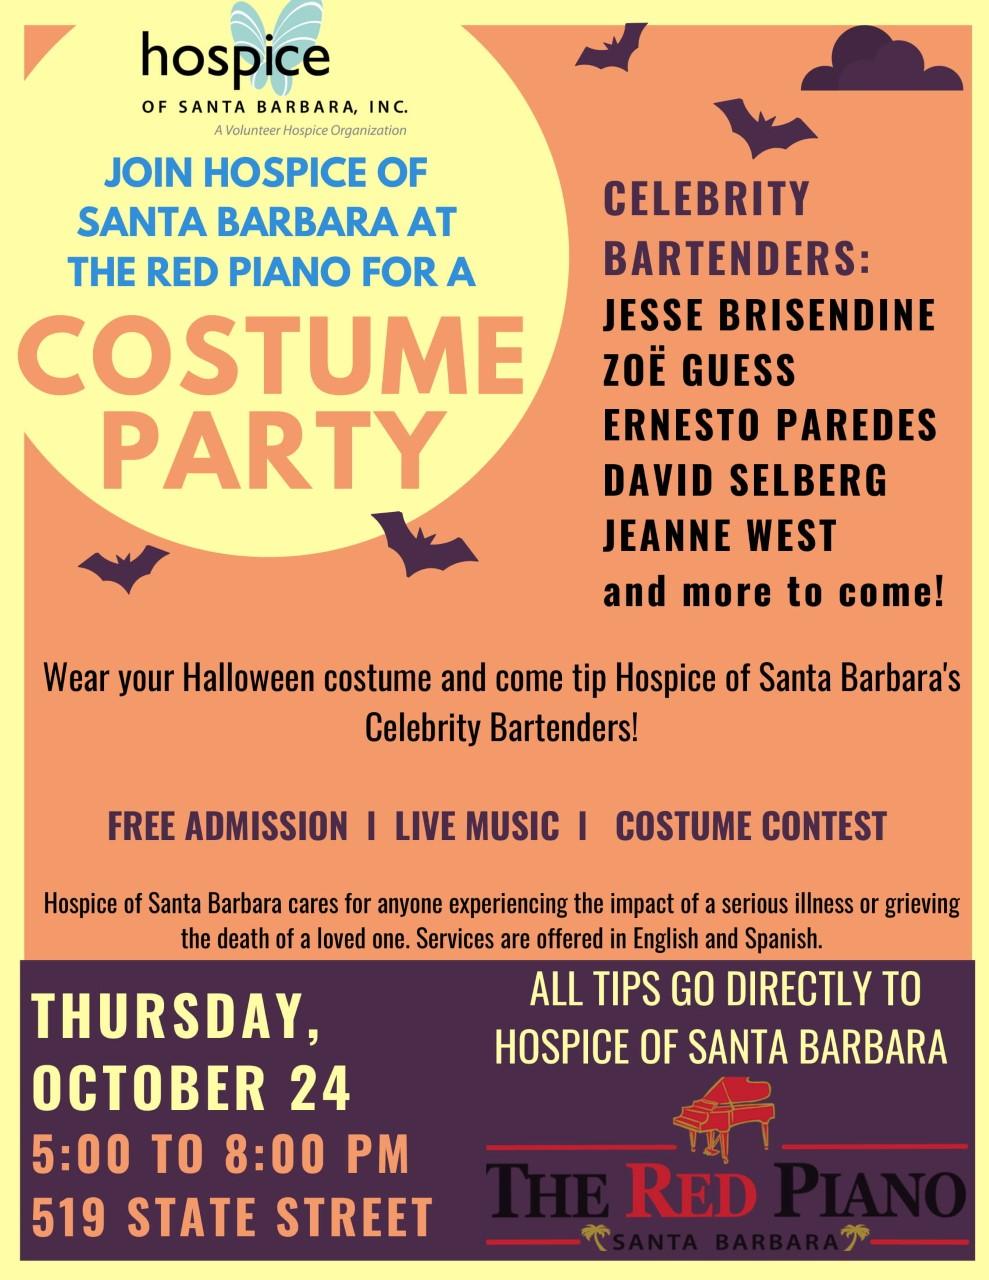 Hospice of Santa Barbara: Costume Party at The Red Piano